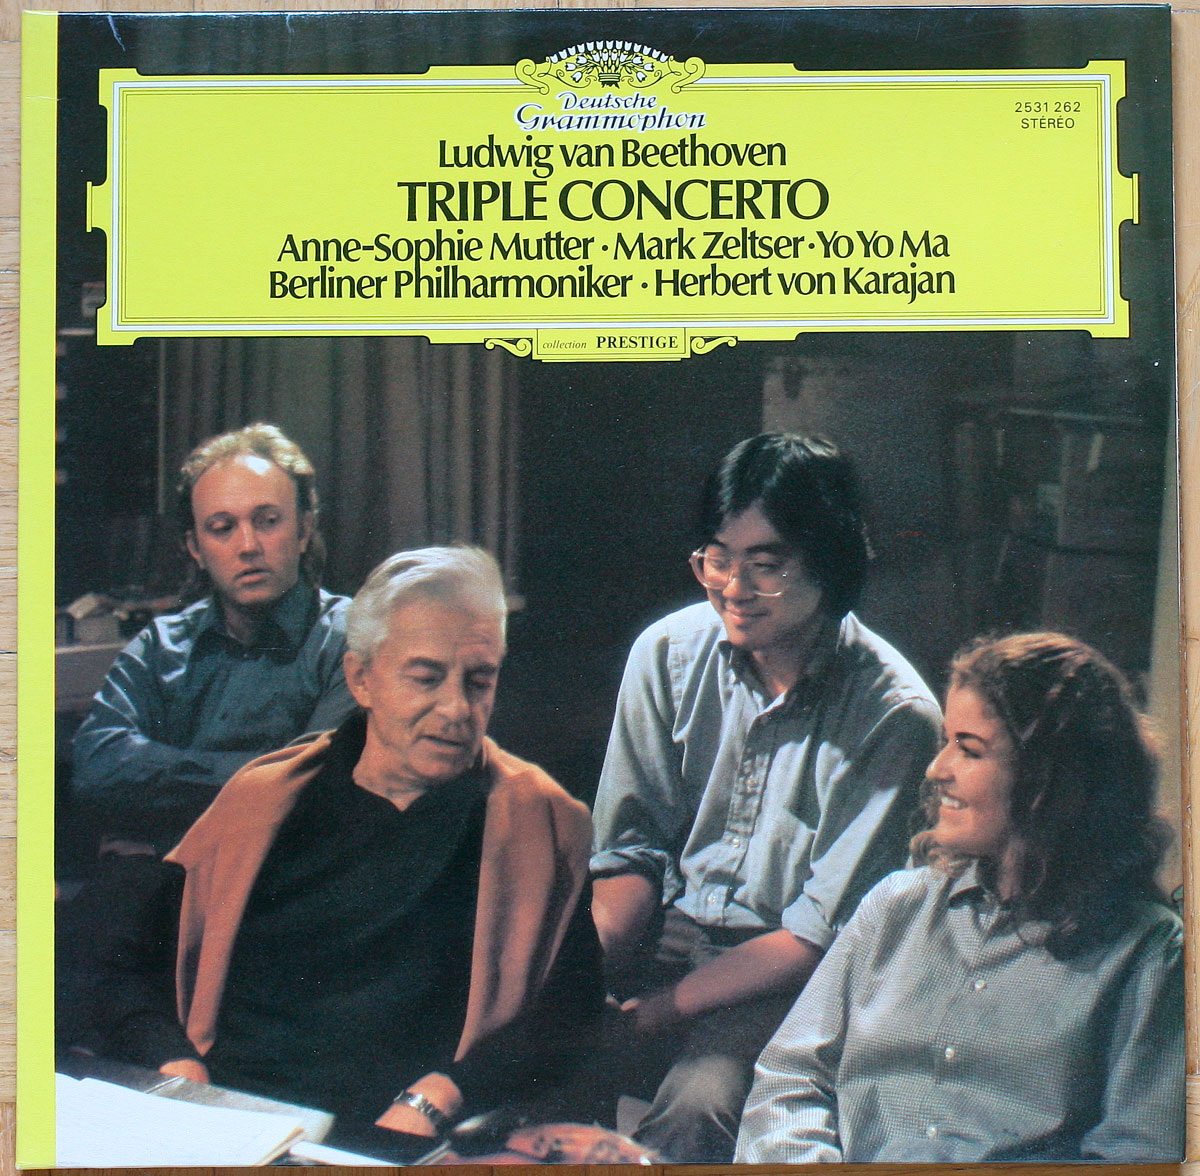 Beethoven Tripelkonzert Triple concerto DGG 2531 262 • Anne-Sophie Mutter Zeltser Yo Yo Ma Karajan